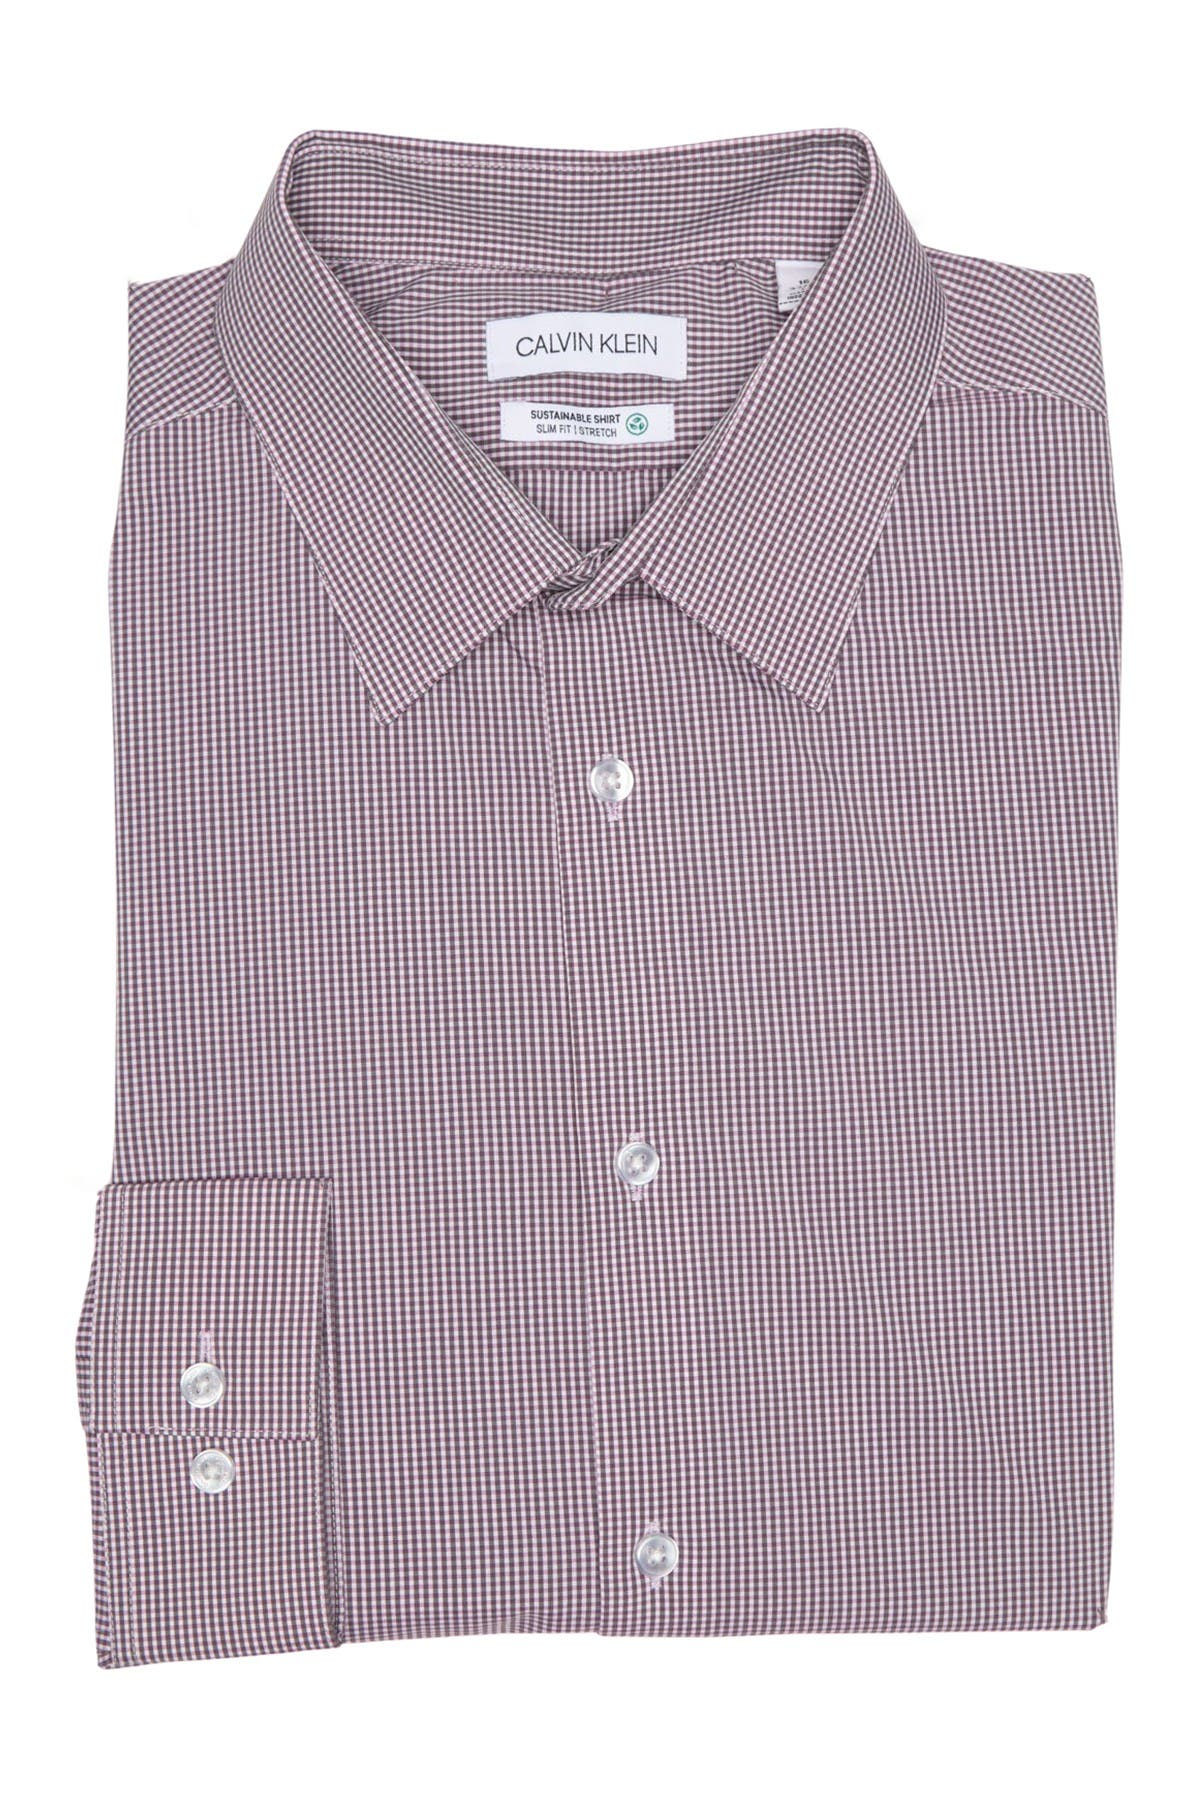 Image of Calvin Klein Micro Print Long Sleeve Slim Fit Shirt